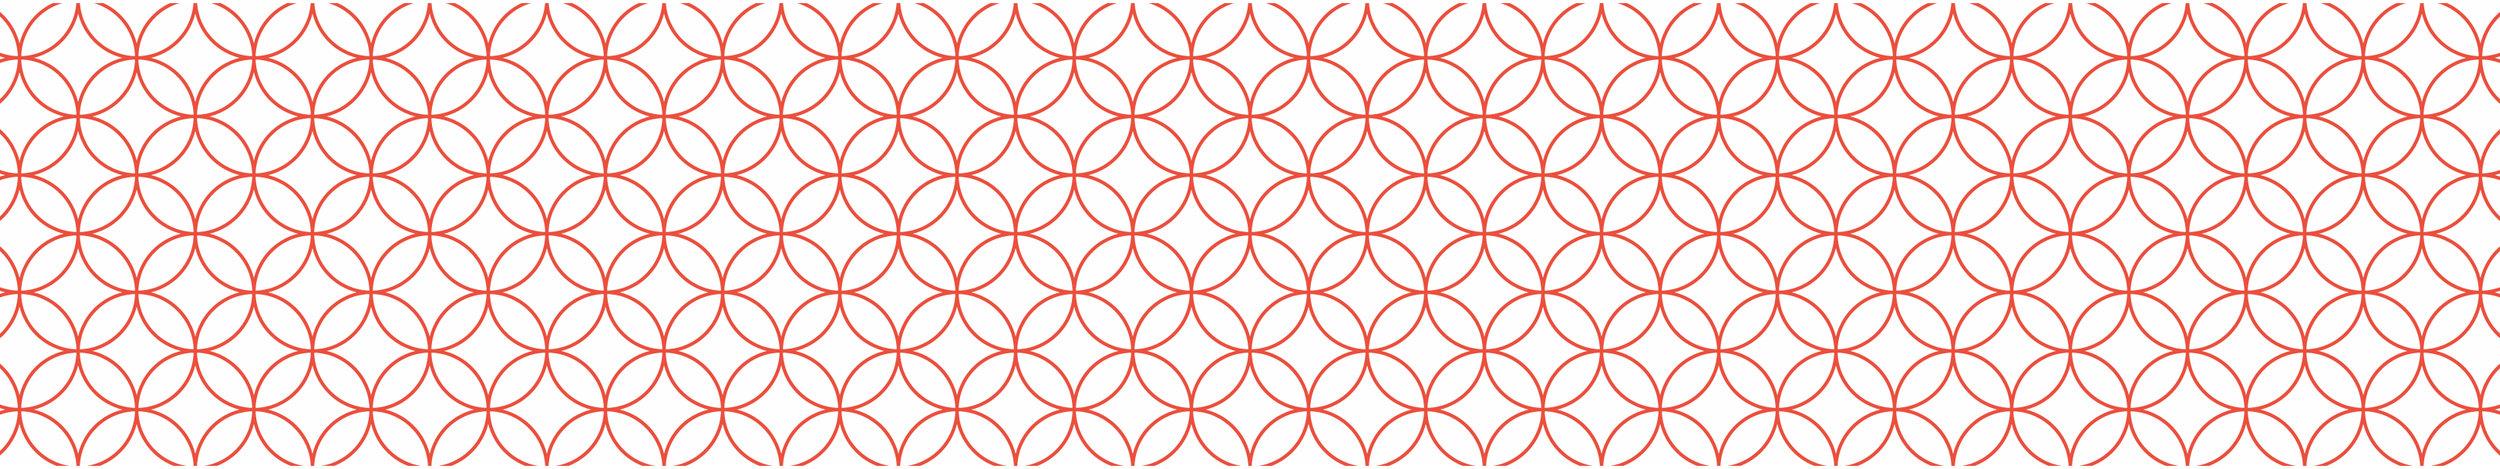 coa-pattern_03@2x.jpg